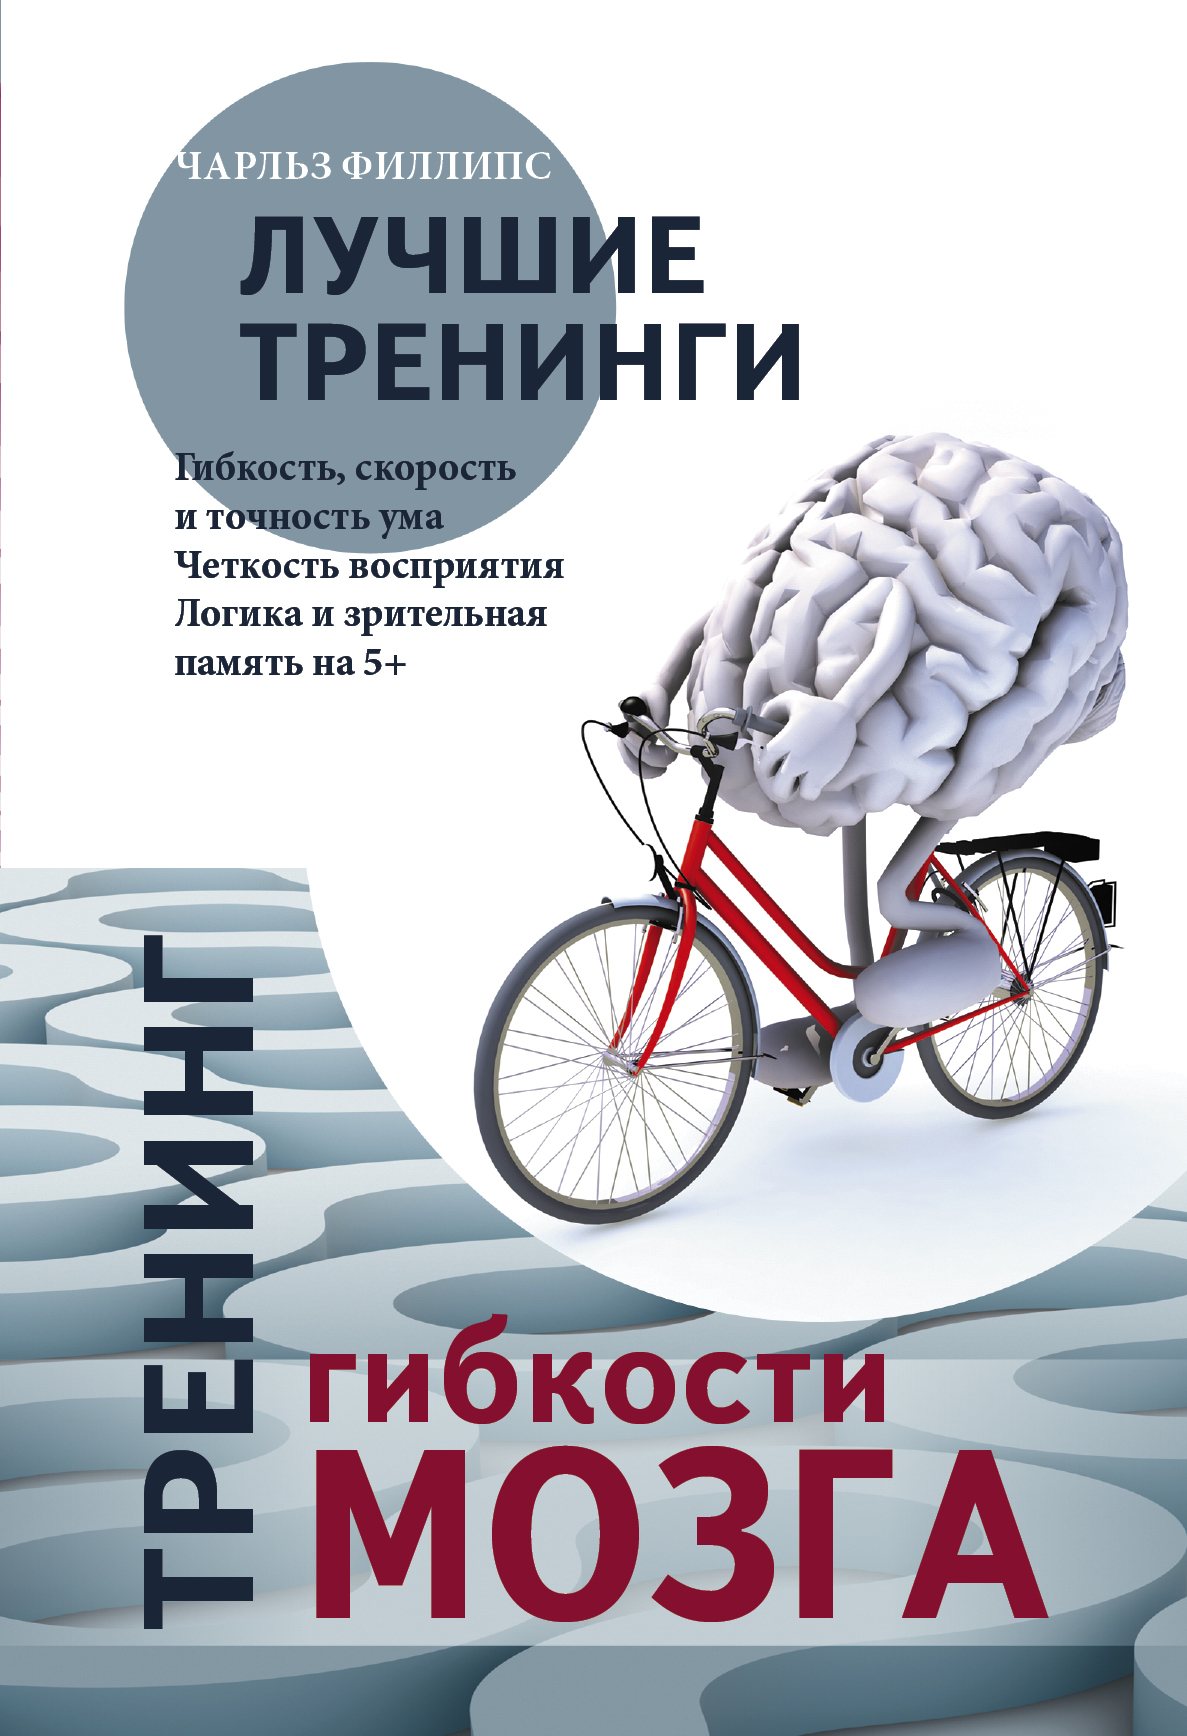 Филлипс Ч. Тренинг силы мозга. Тренинг гибкости мозга